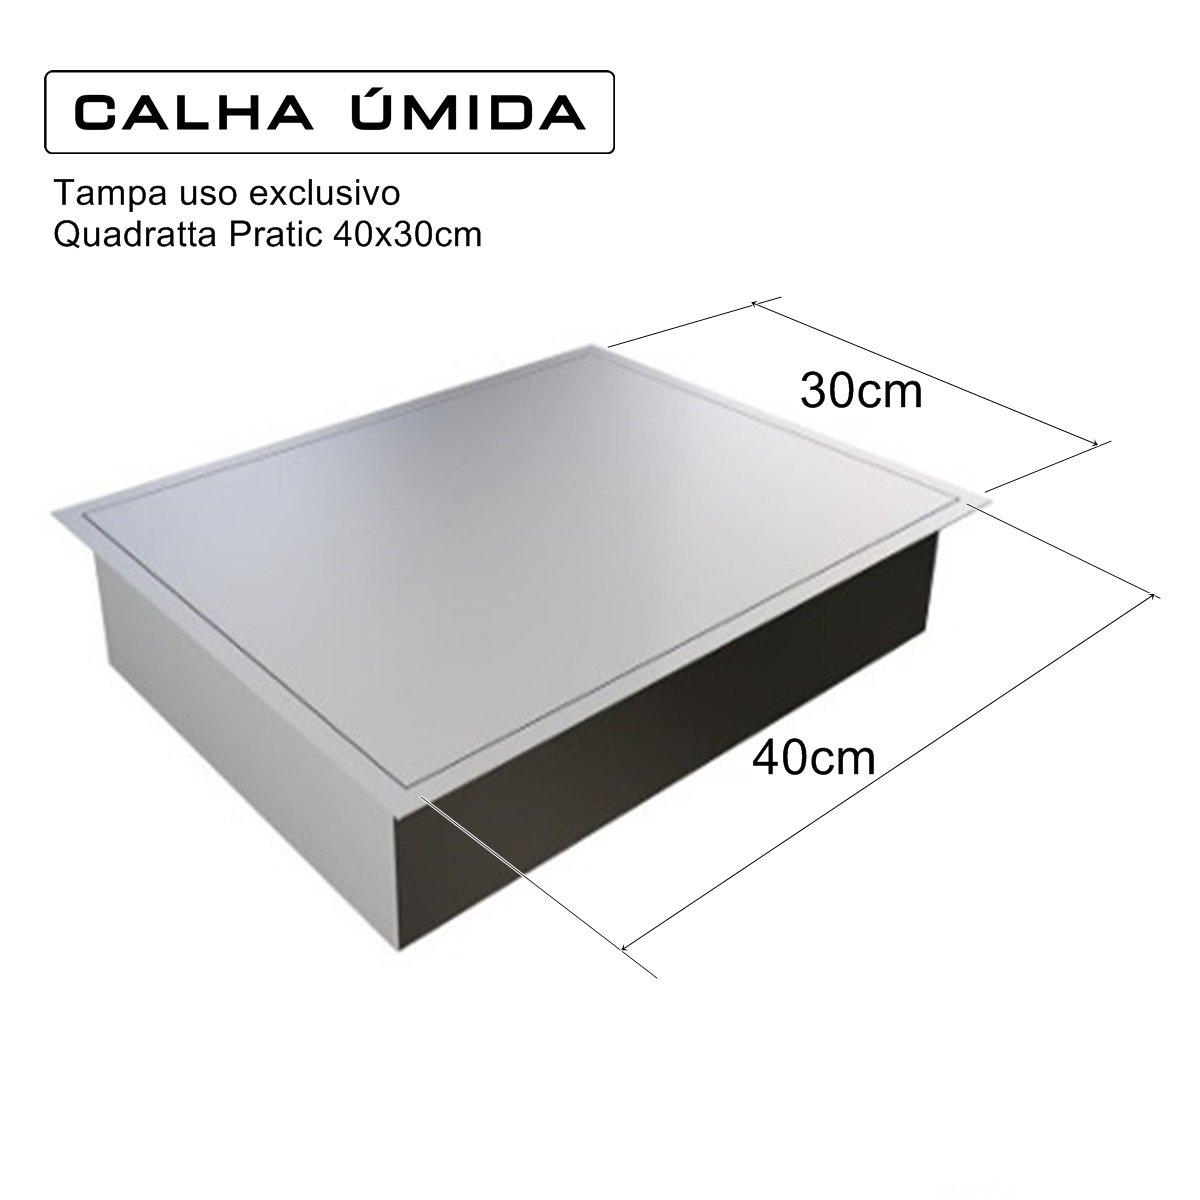 Tampa Para Calha Úmida Lateral Quadratta Pratic 40x30cm